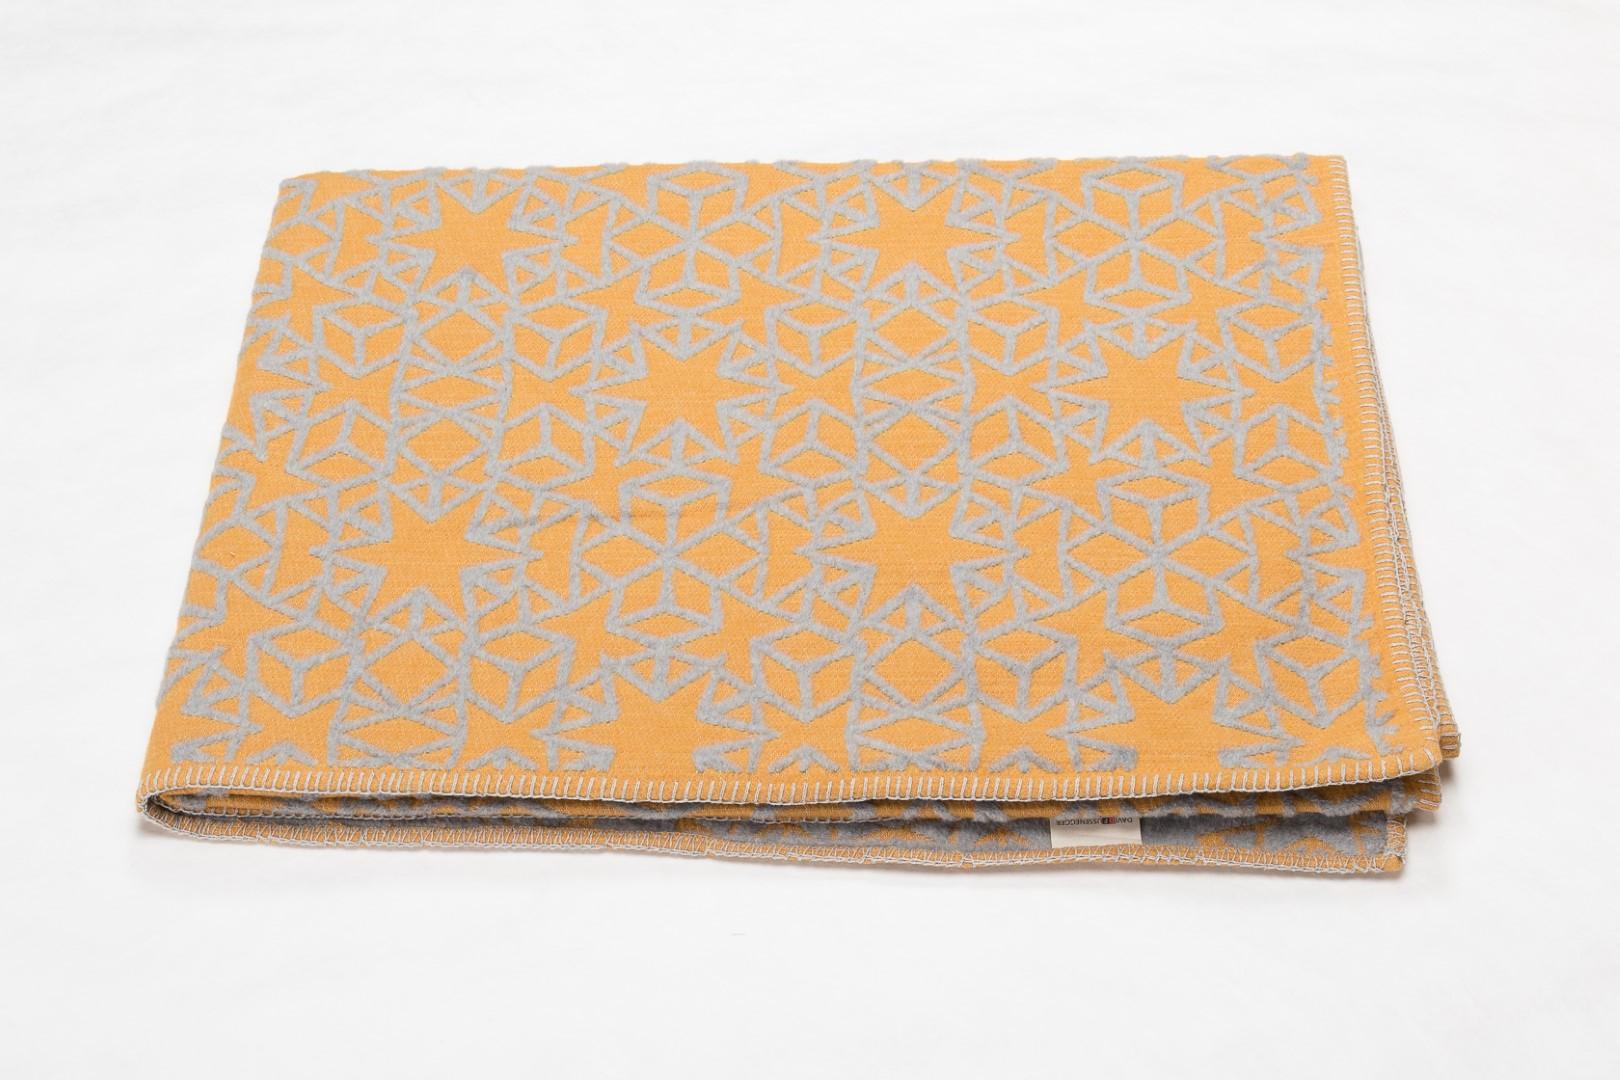 DAVID FUSSENEGGER Decke, Plaid Deco, Stern modern, goldgelb, 130x200 cm